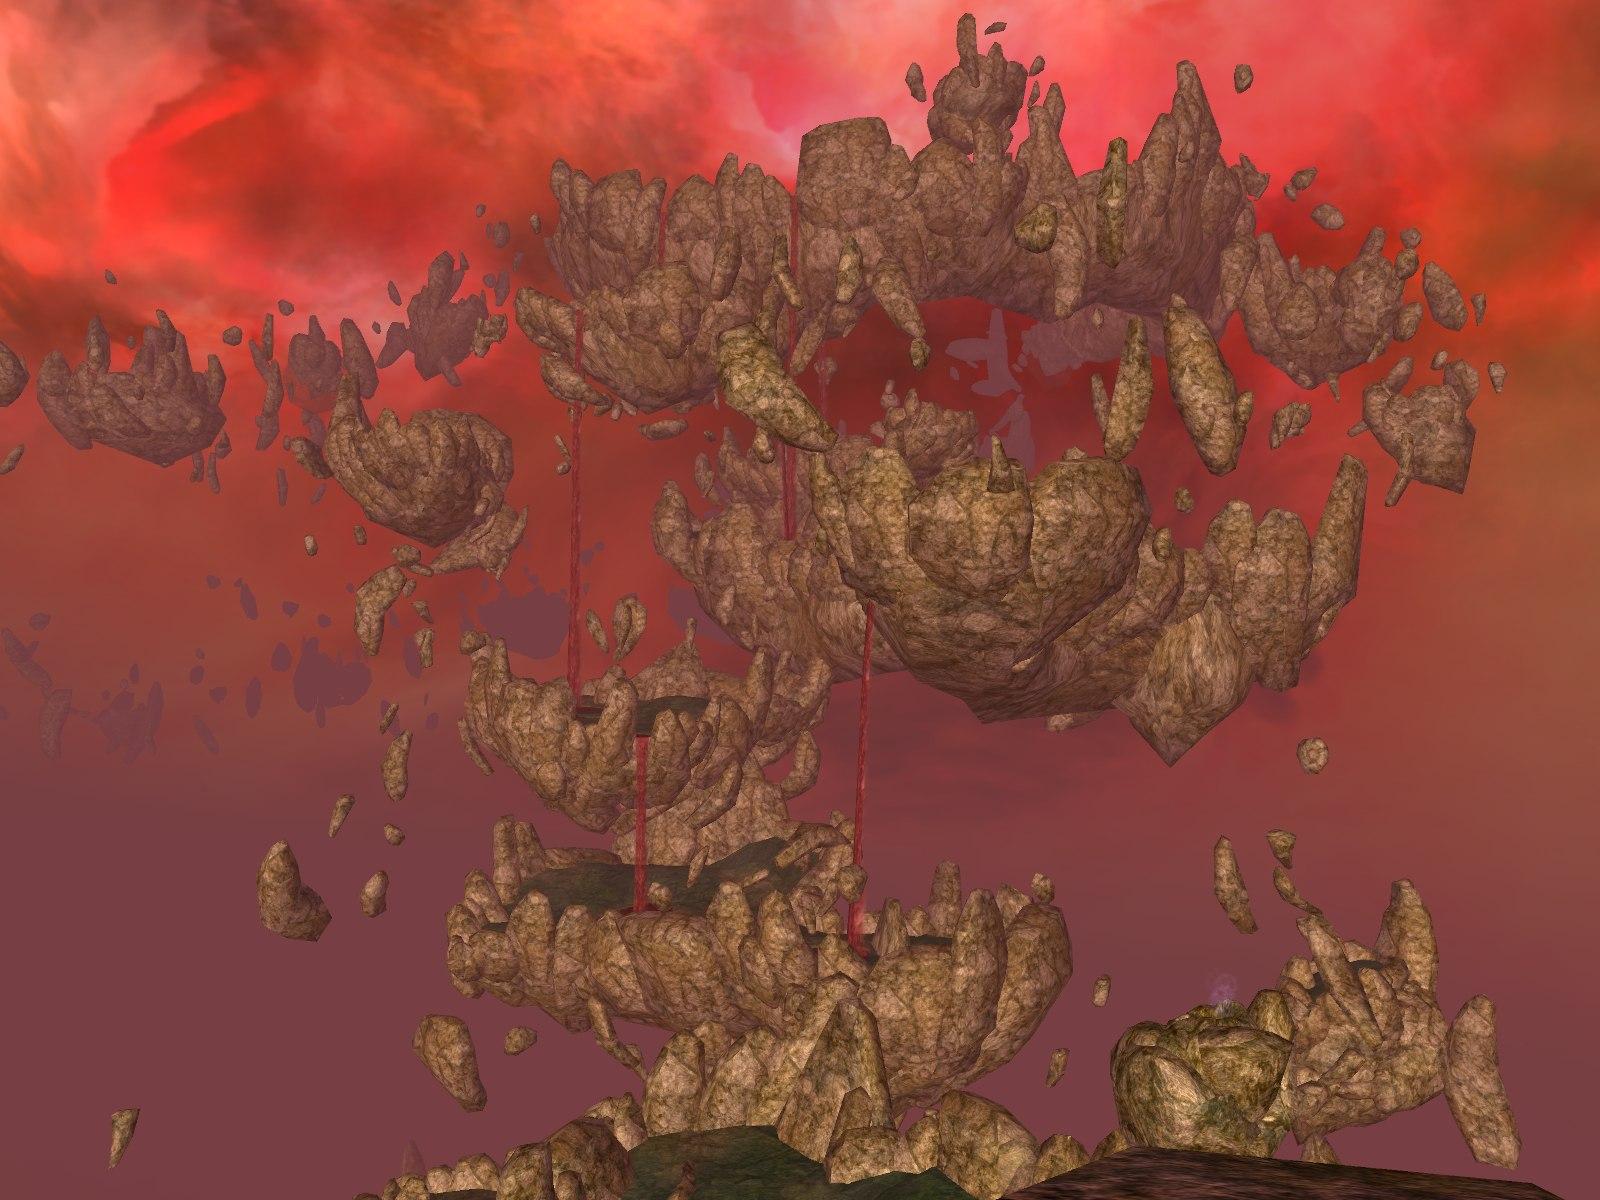 Floating islands of rock